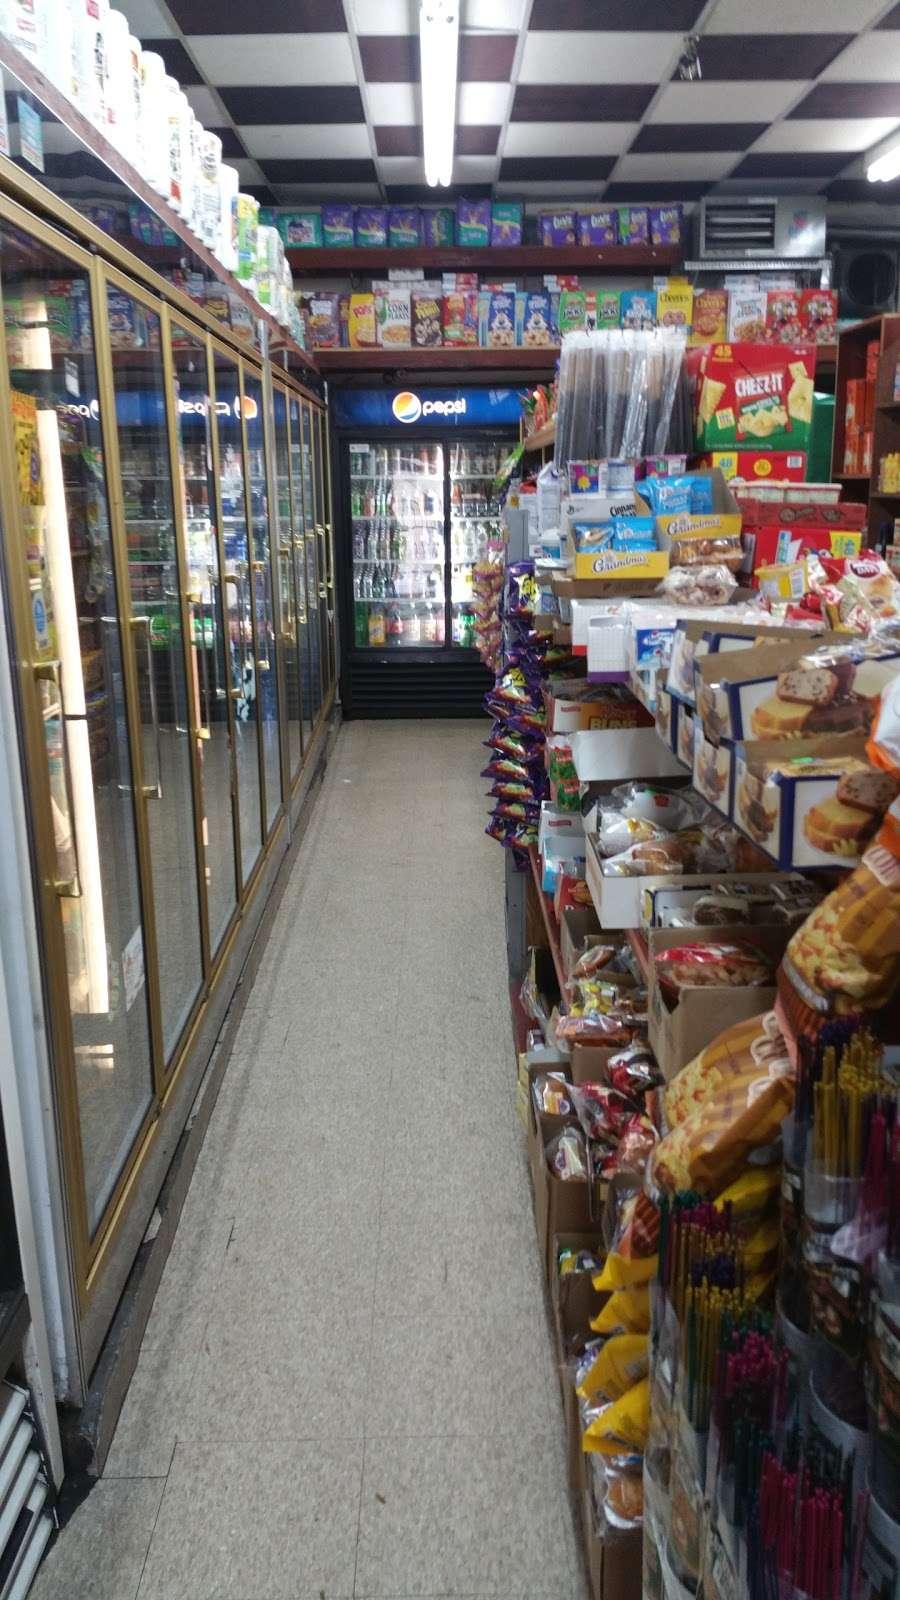 Highbridge Deli - store    Photo 1 of 1   Address: 156 W 166th St, Bronx, NY 10452, USA   Phone: (917) 631-9990